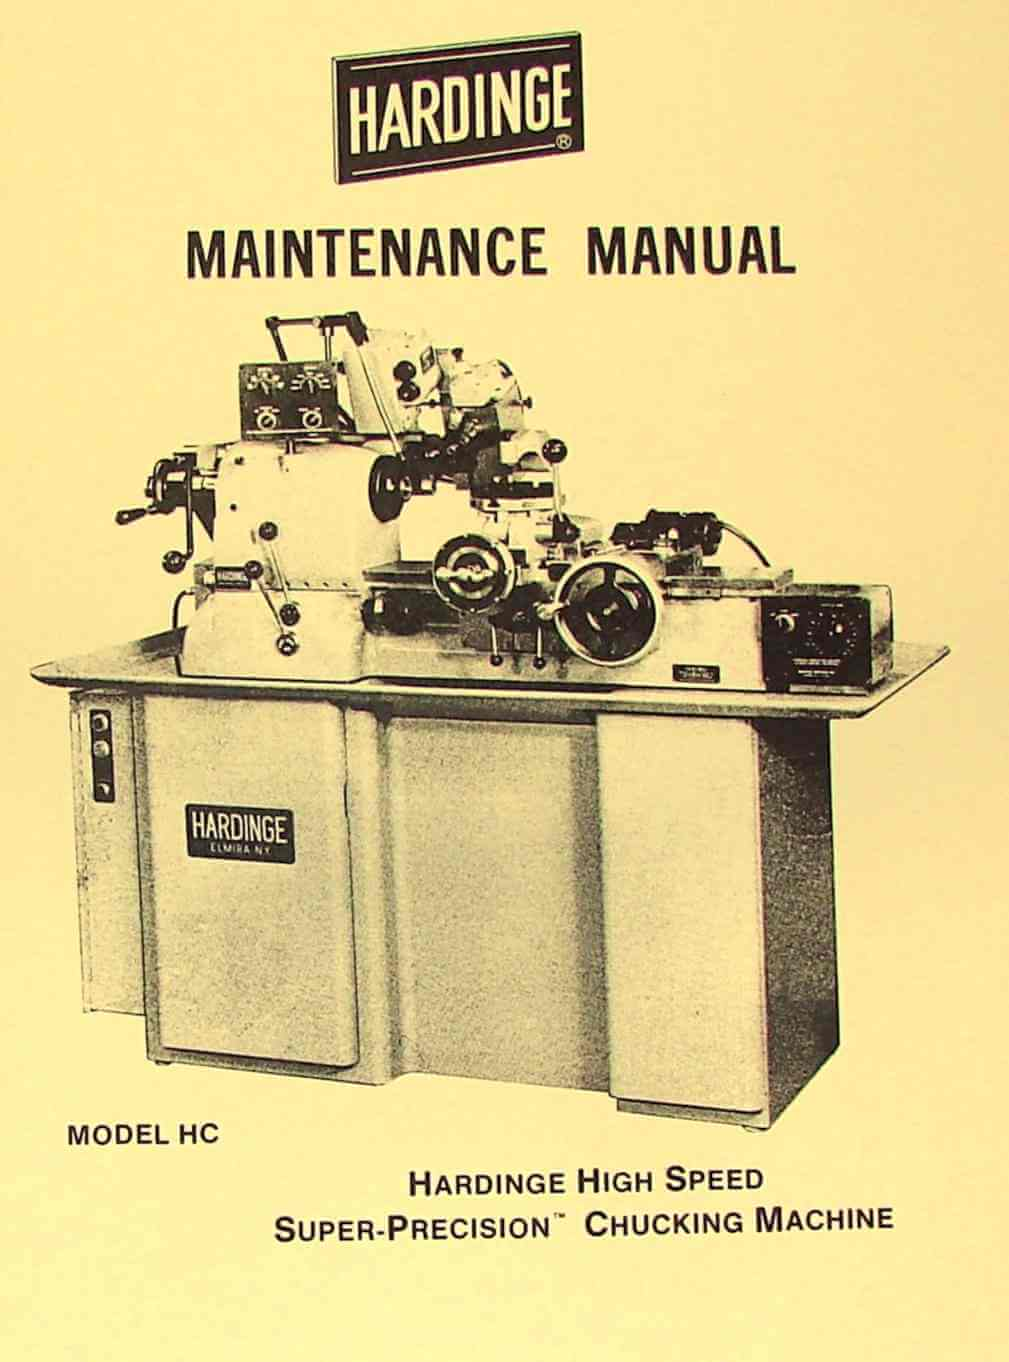 hardinge hc hct chucking lathe maintenance manual ozark tool rh ozarktoolmanuals com hardinge manual lathe for sale hardinge lathe parts list